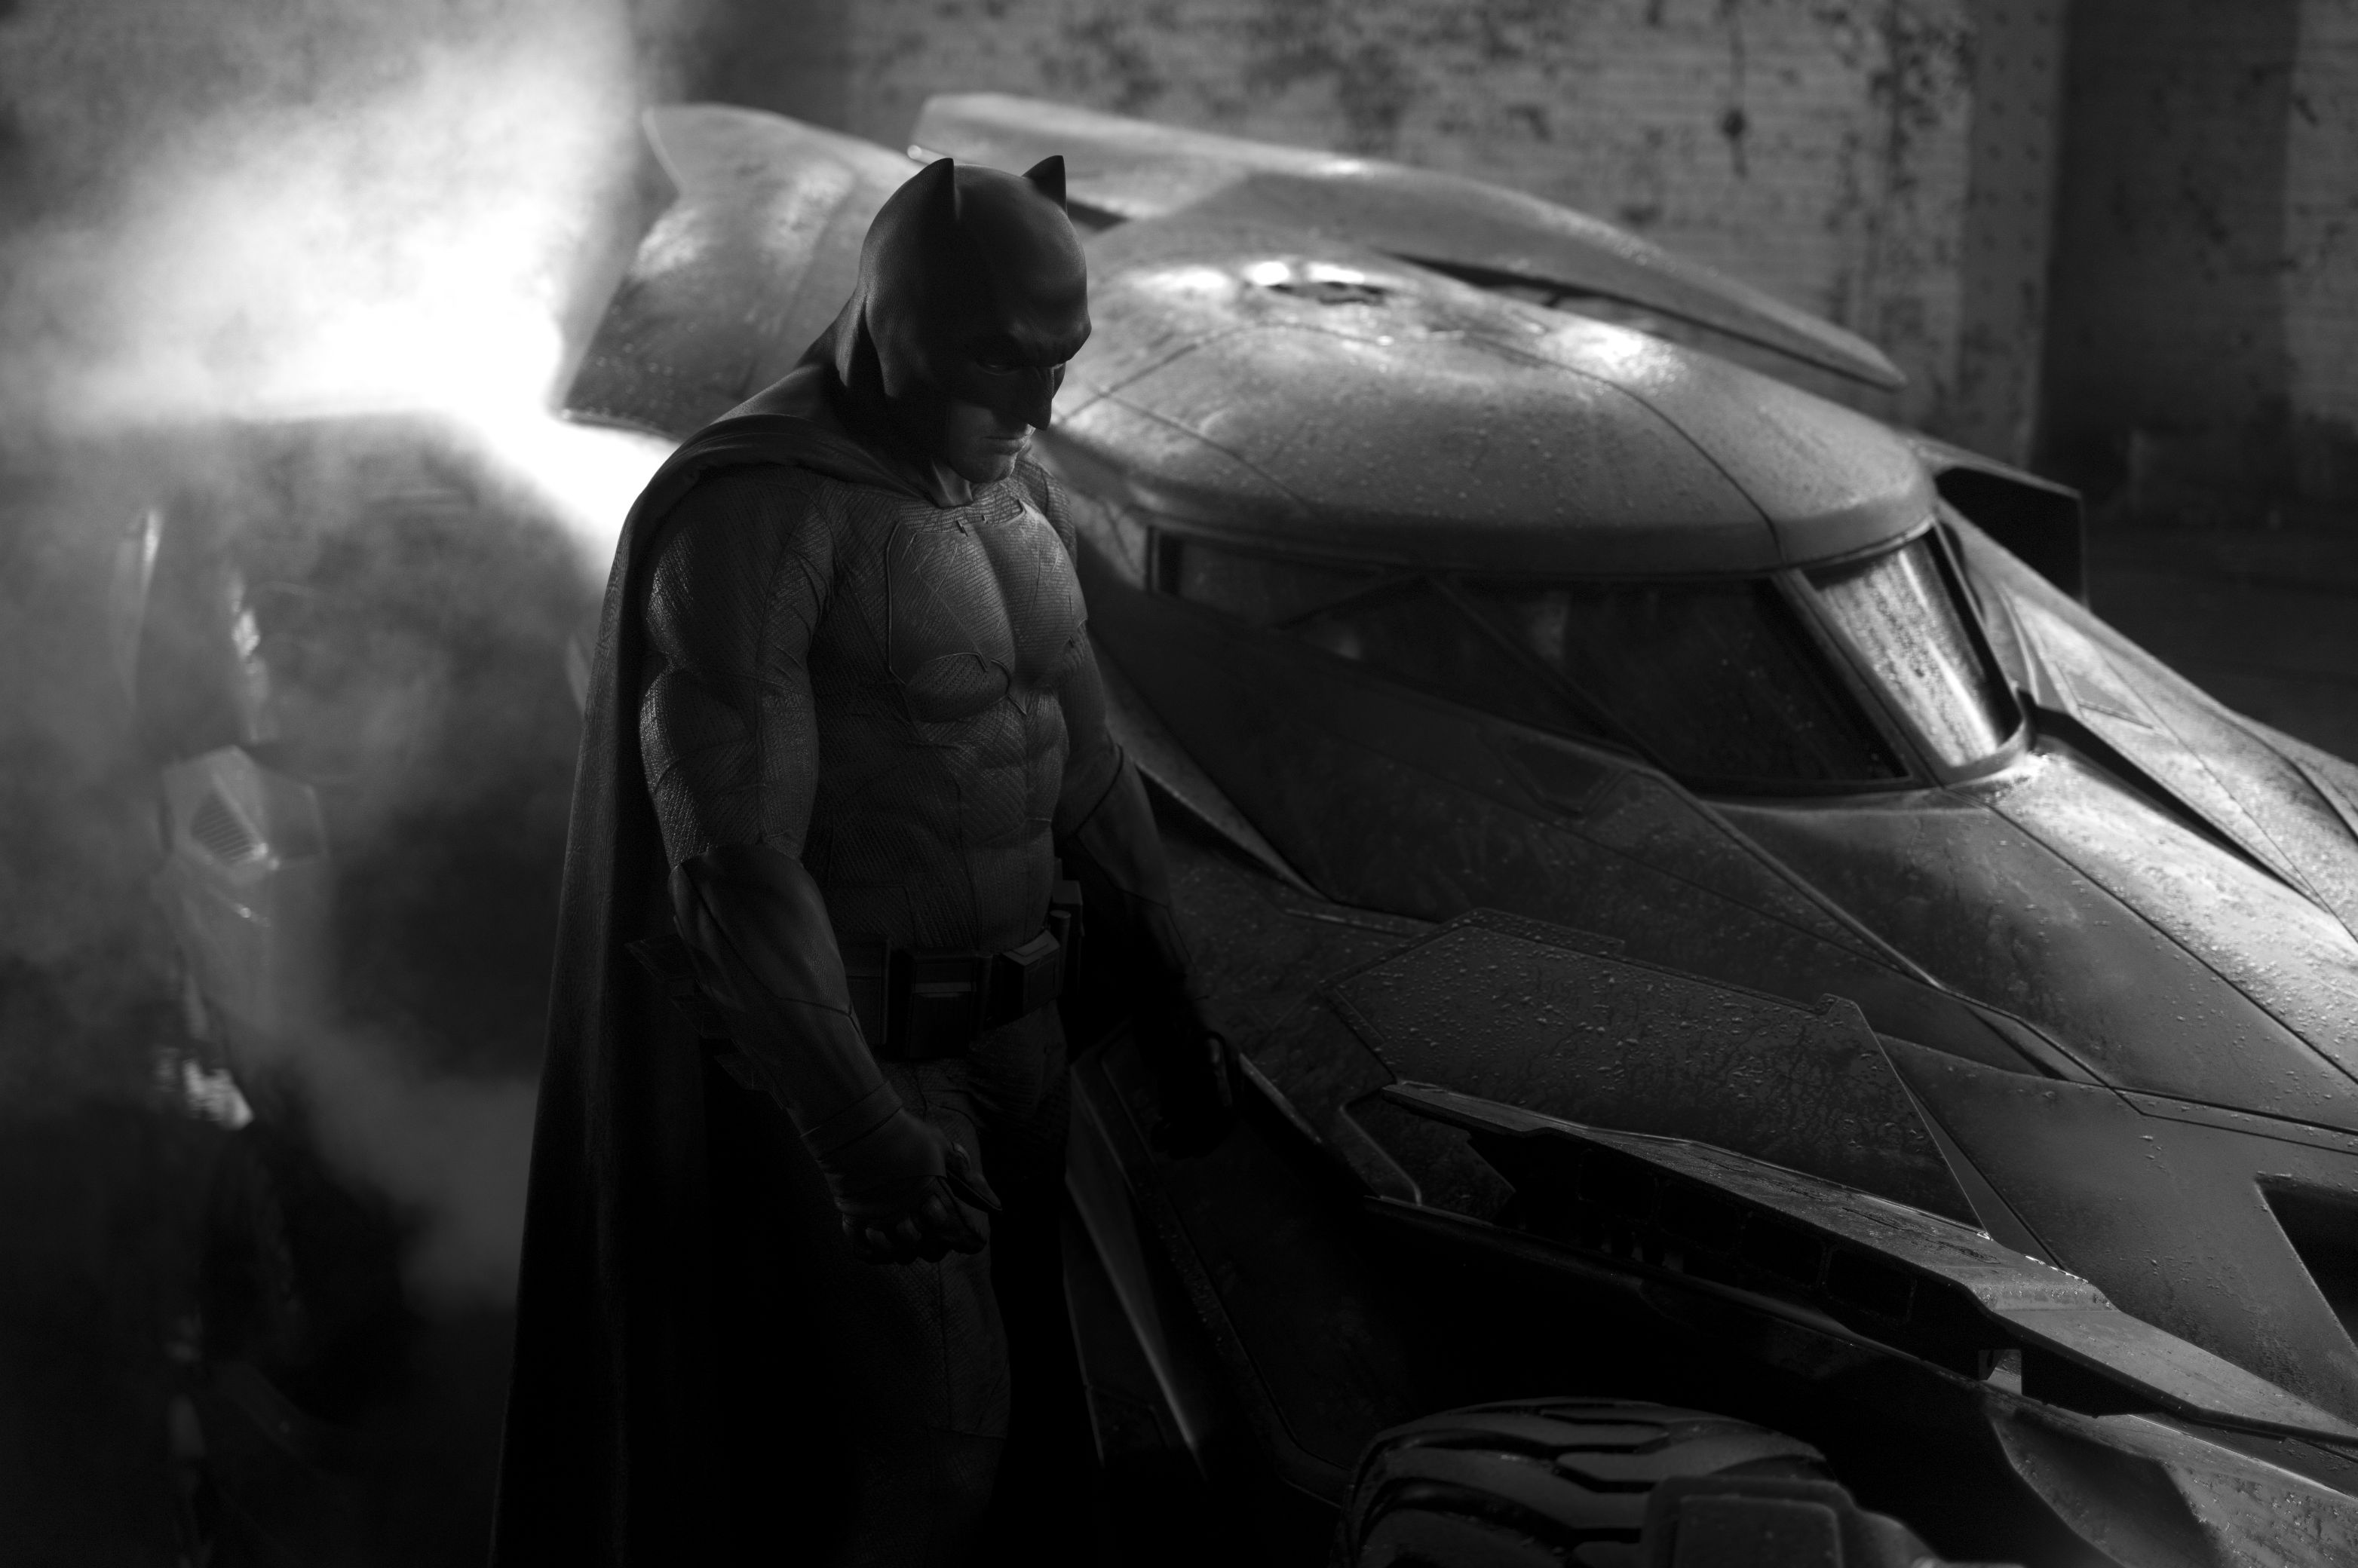 batman-affleck-batman-new-batmobile